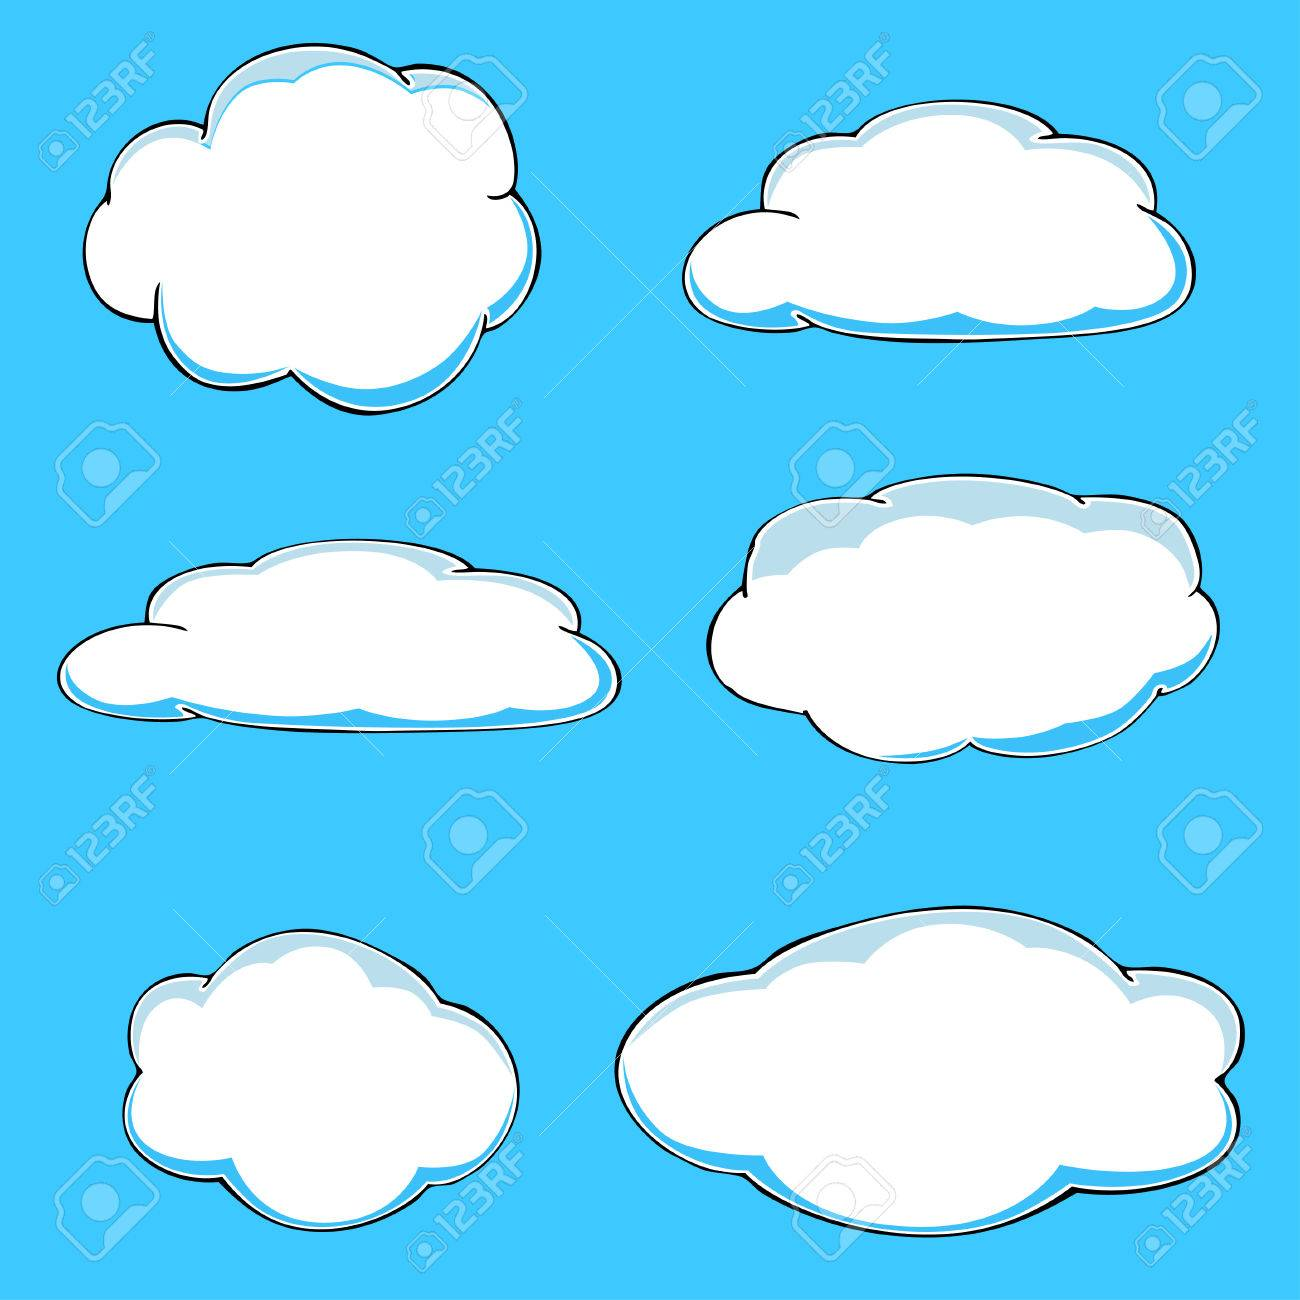 cartoon clouds illustration on blue background vector royalty free rh 123rf com cloud vectors free cloud vector free